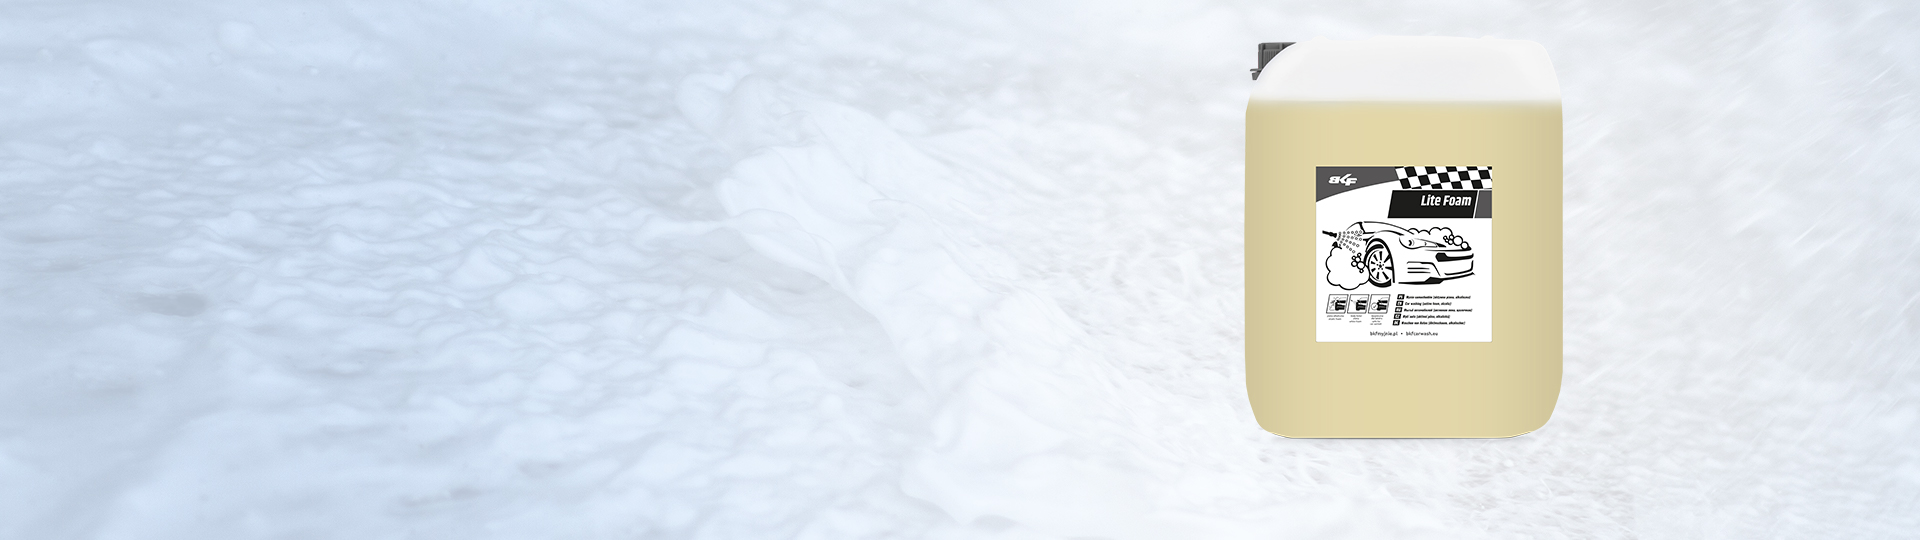 slider – promo – Alka lite foam